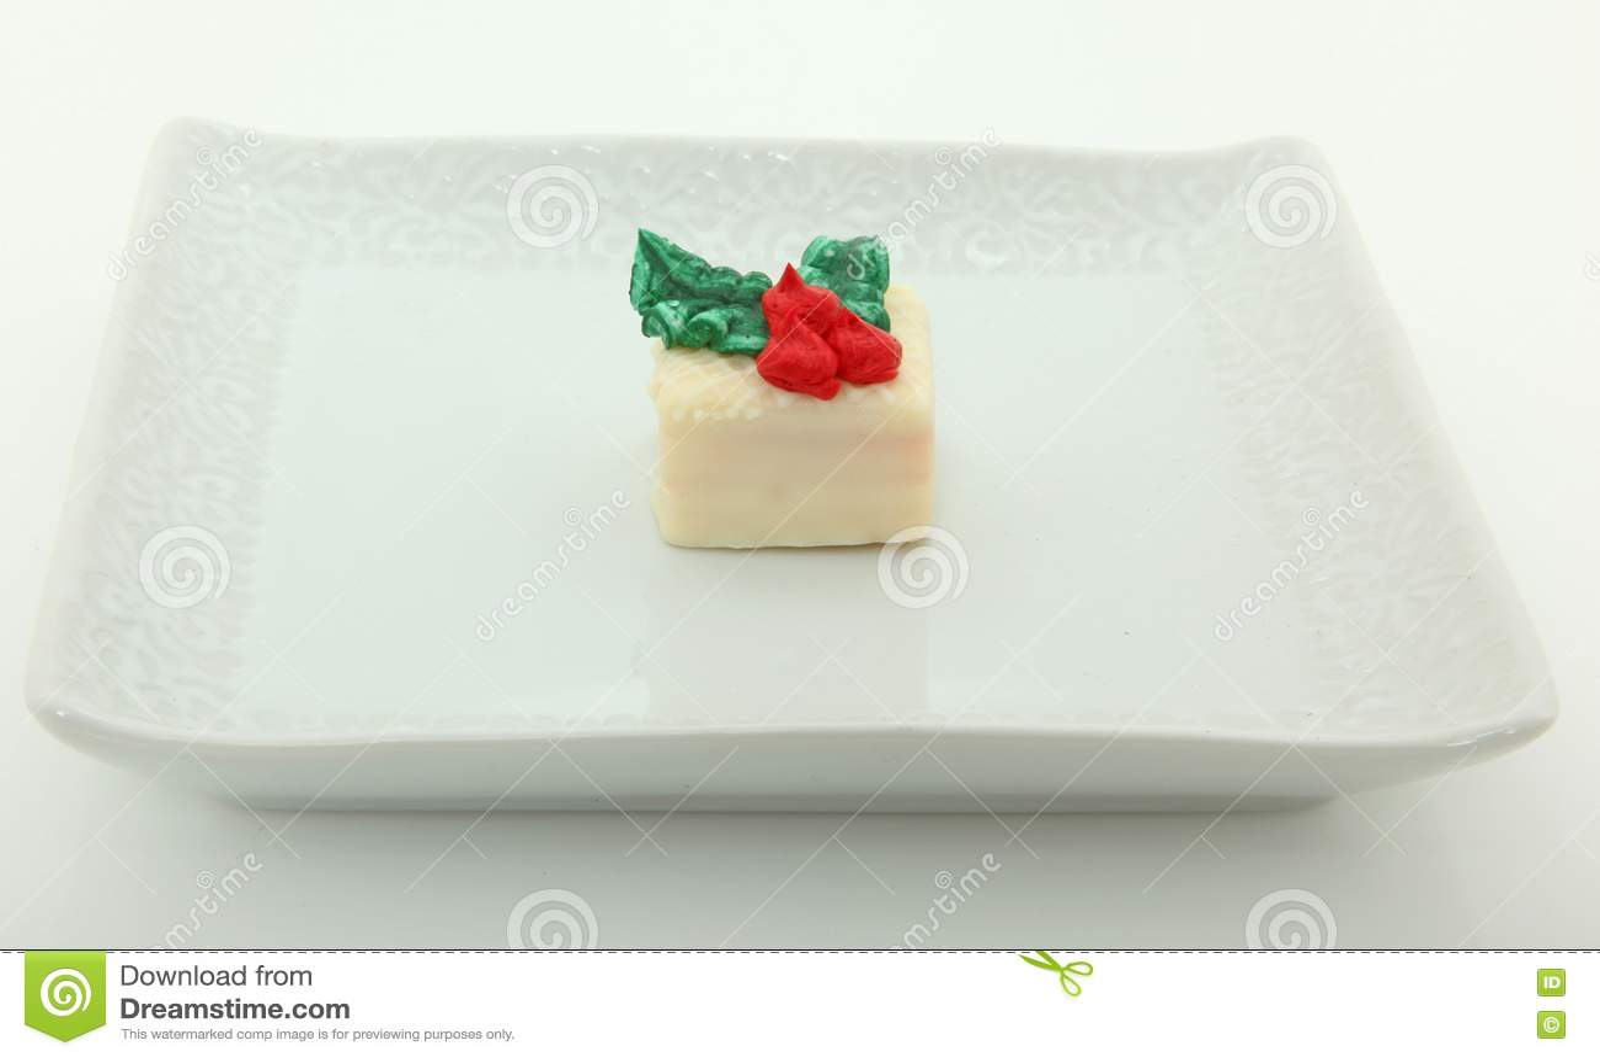 Munster single scoop